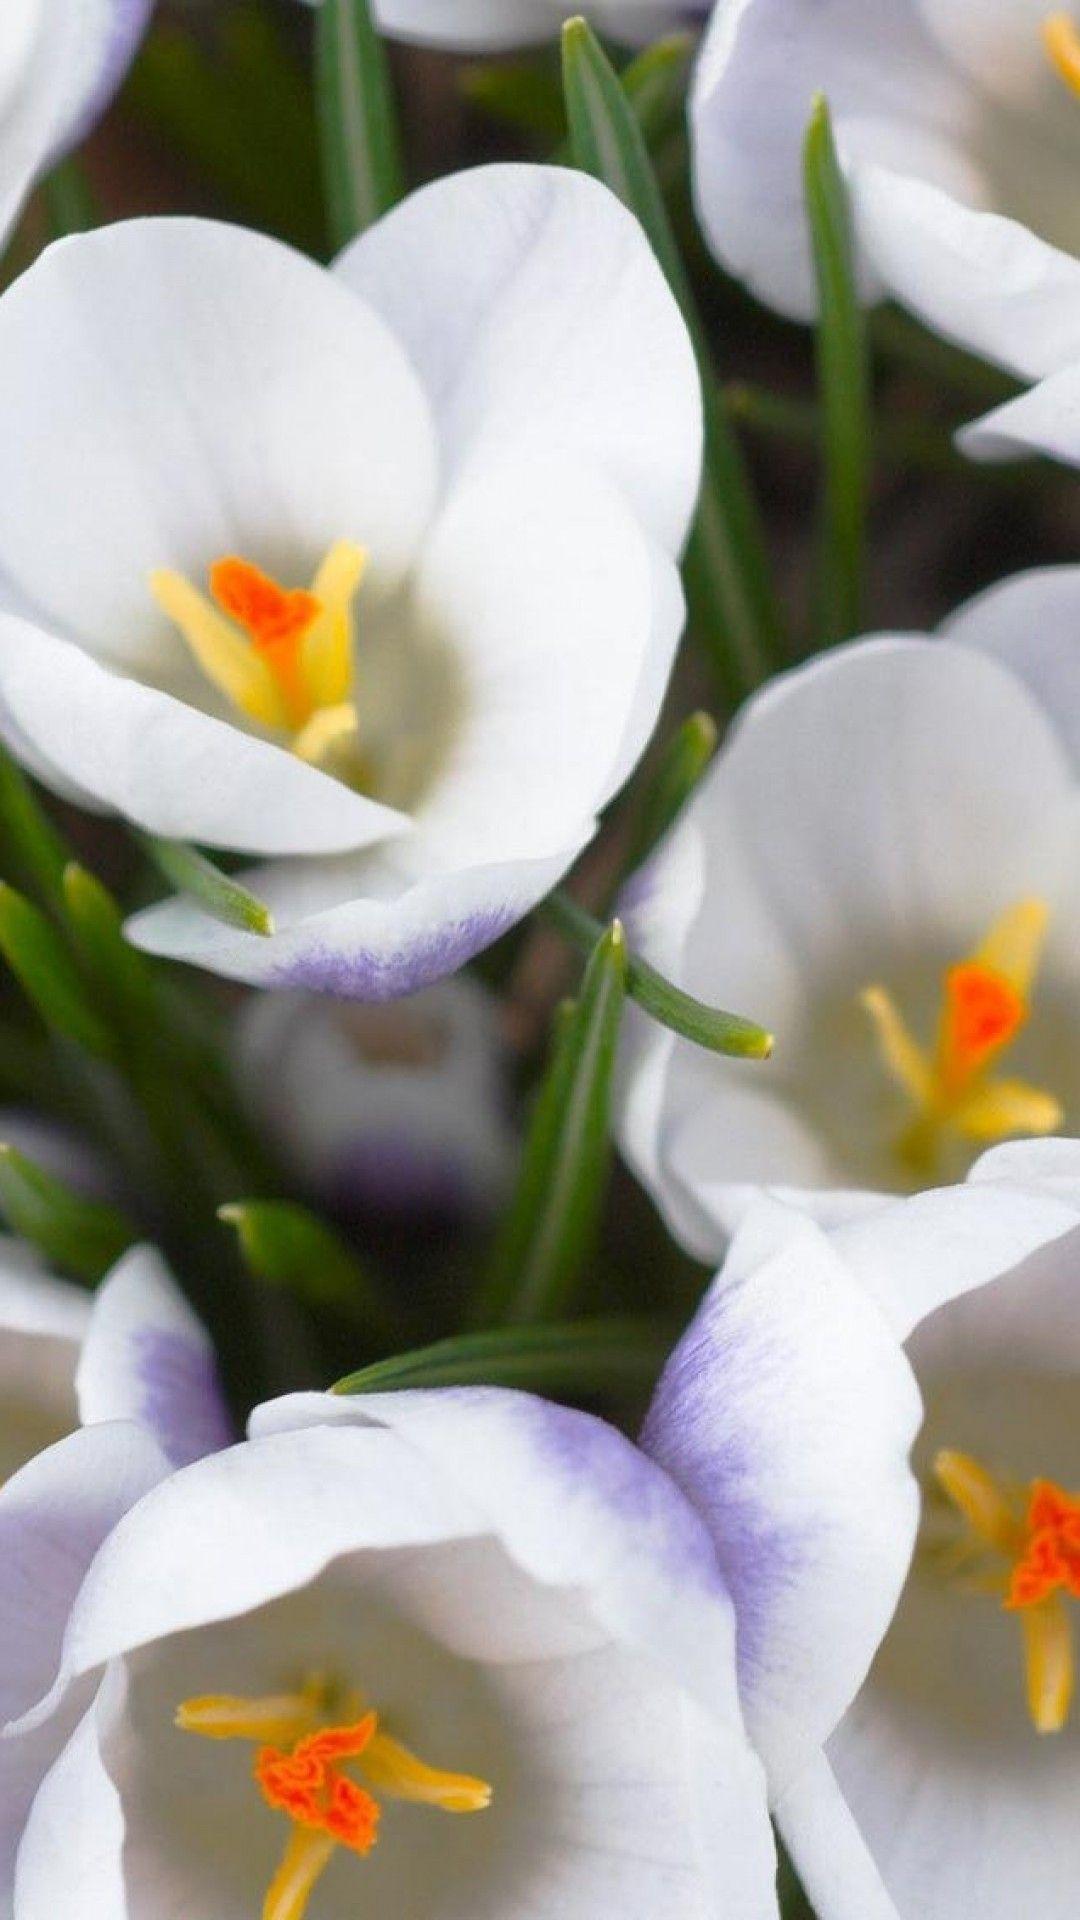 Crocus Flowers Photo On A Smartphone